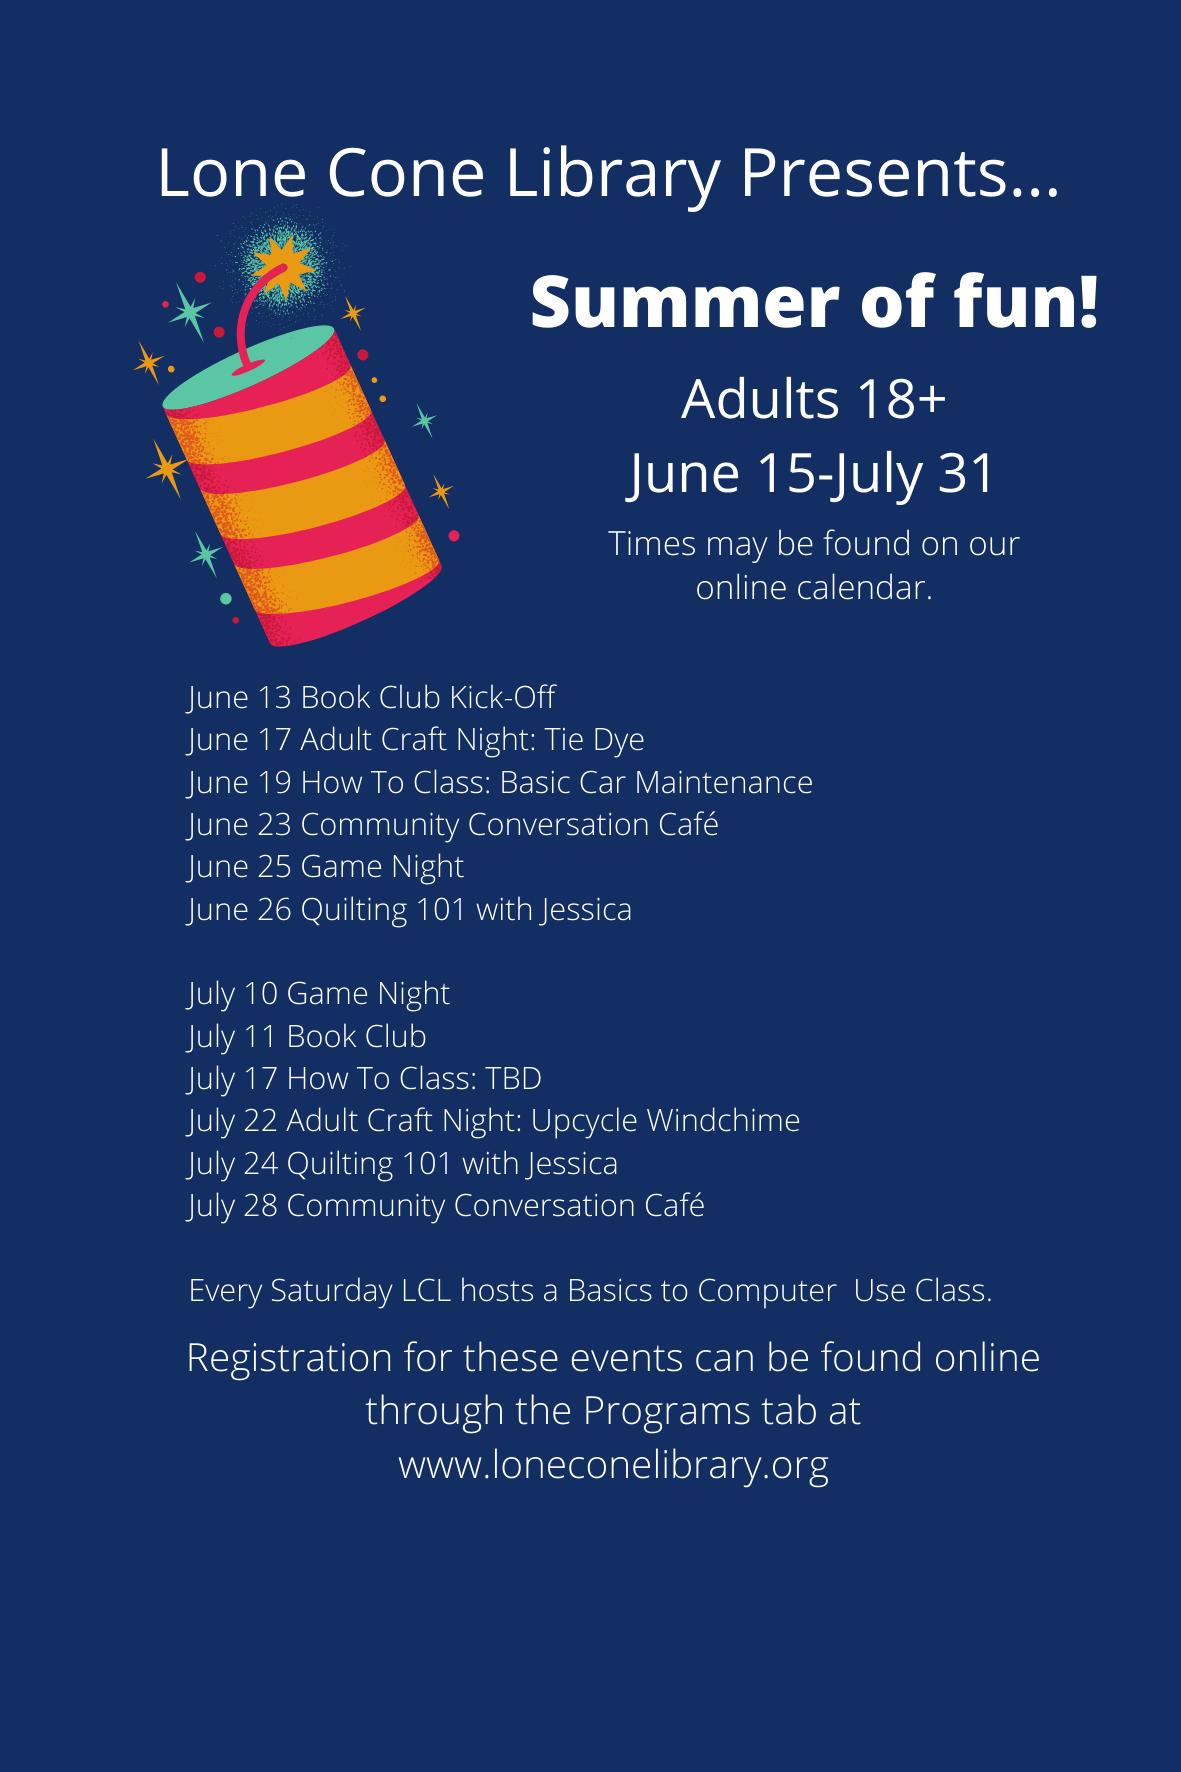 Summer program list